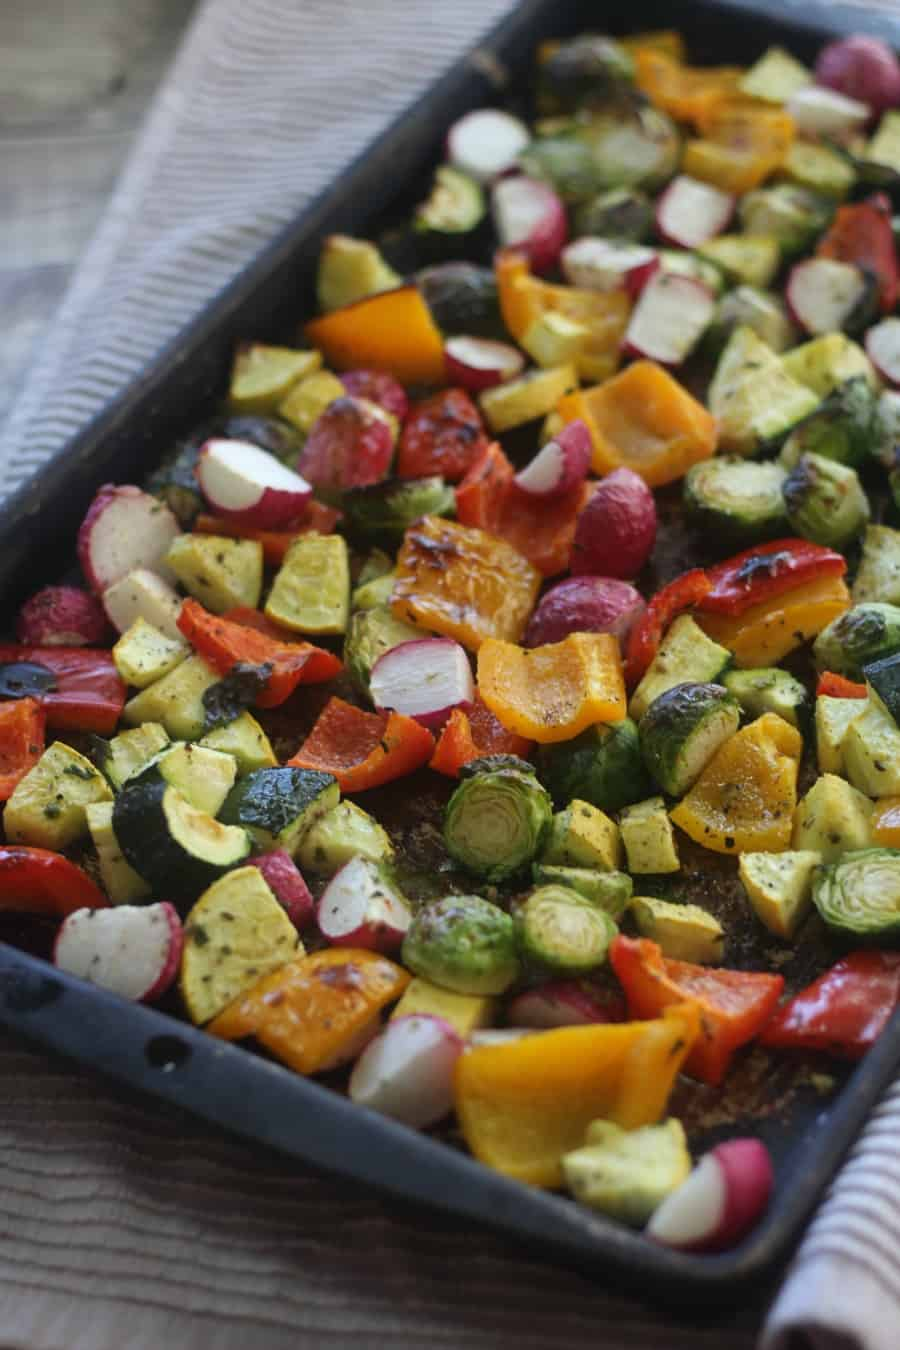 Sheet Pan Roasted Low Carb Veggies Keto Side Dishes